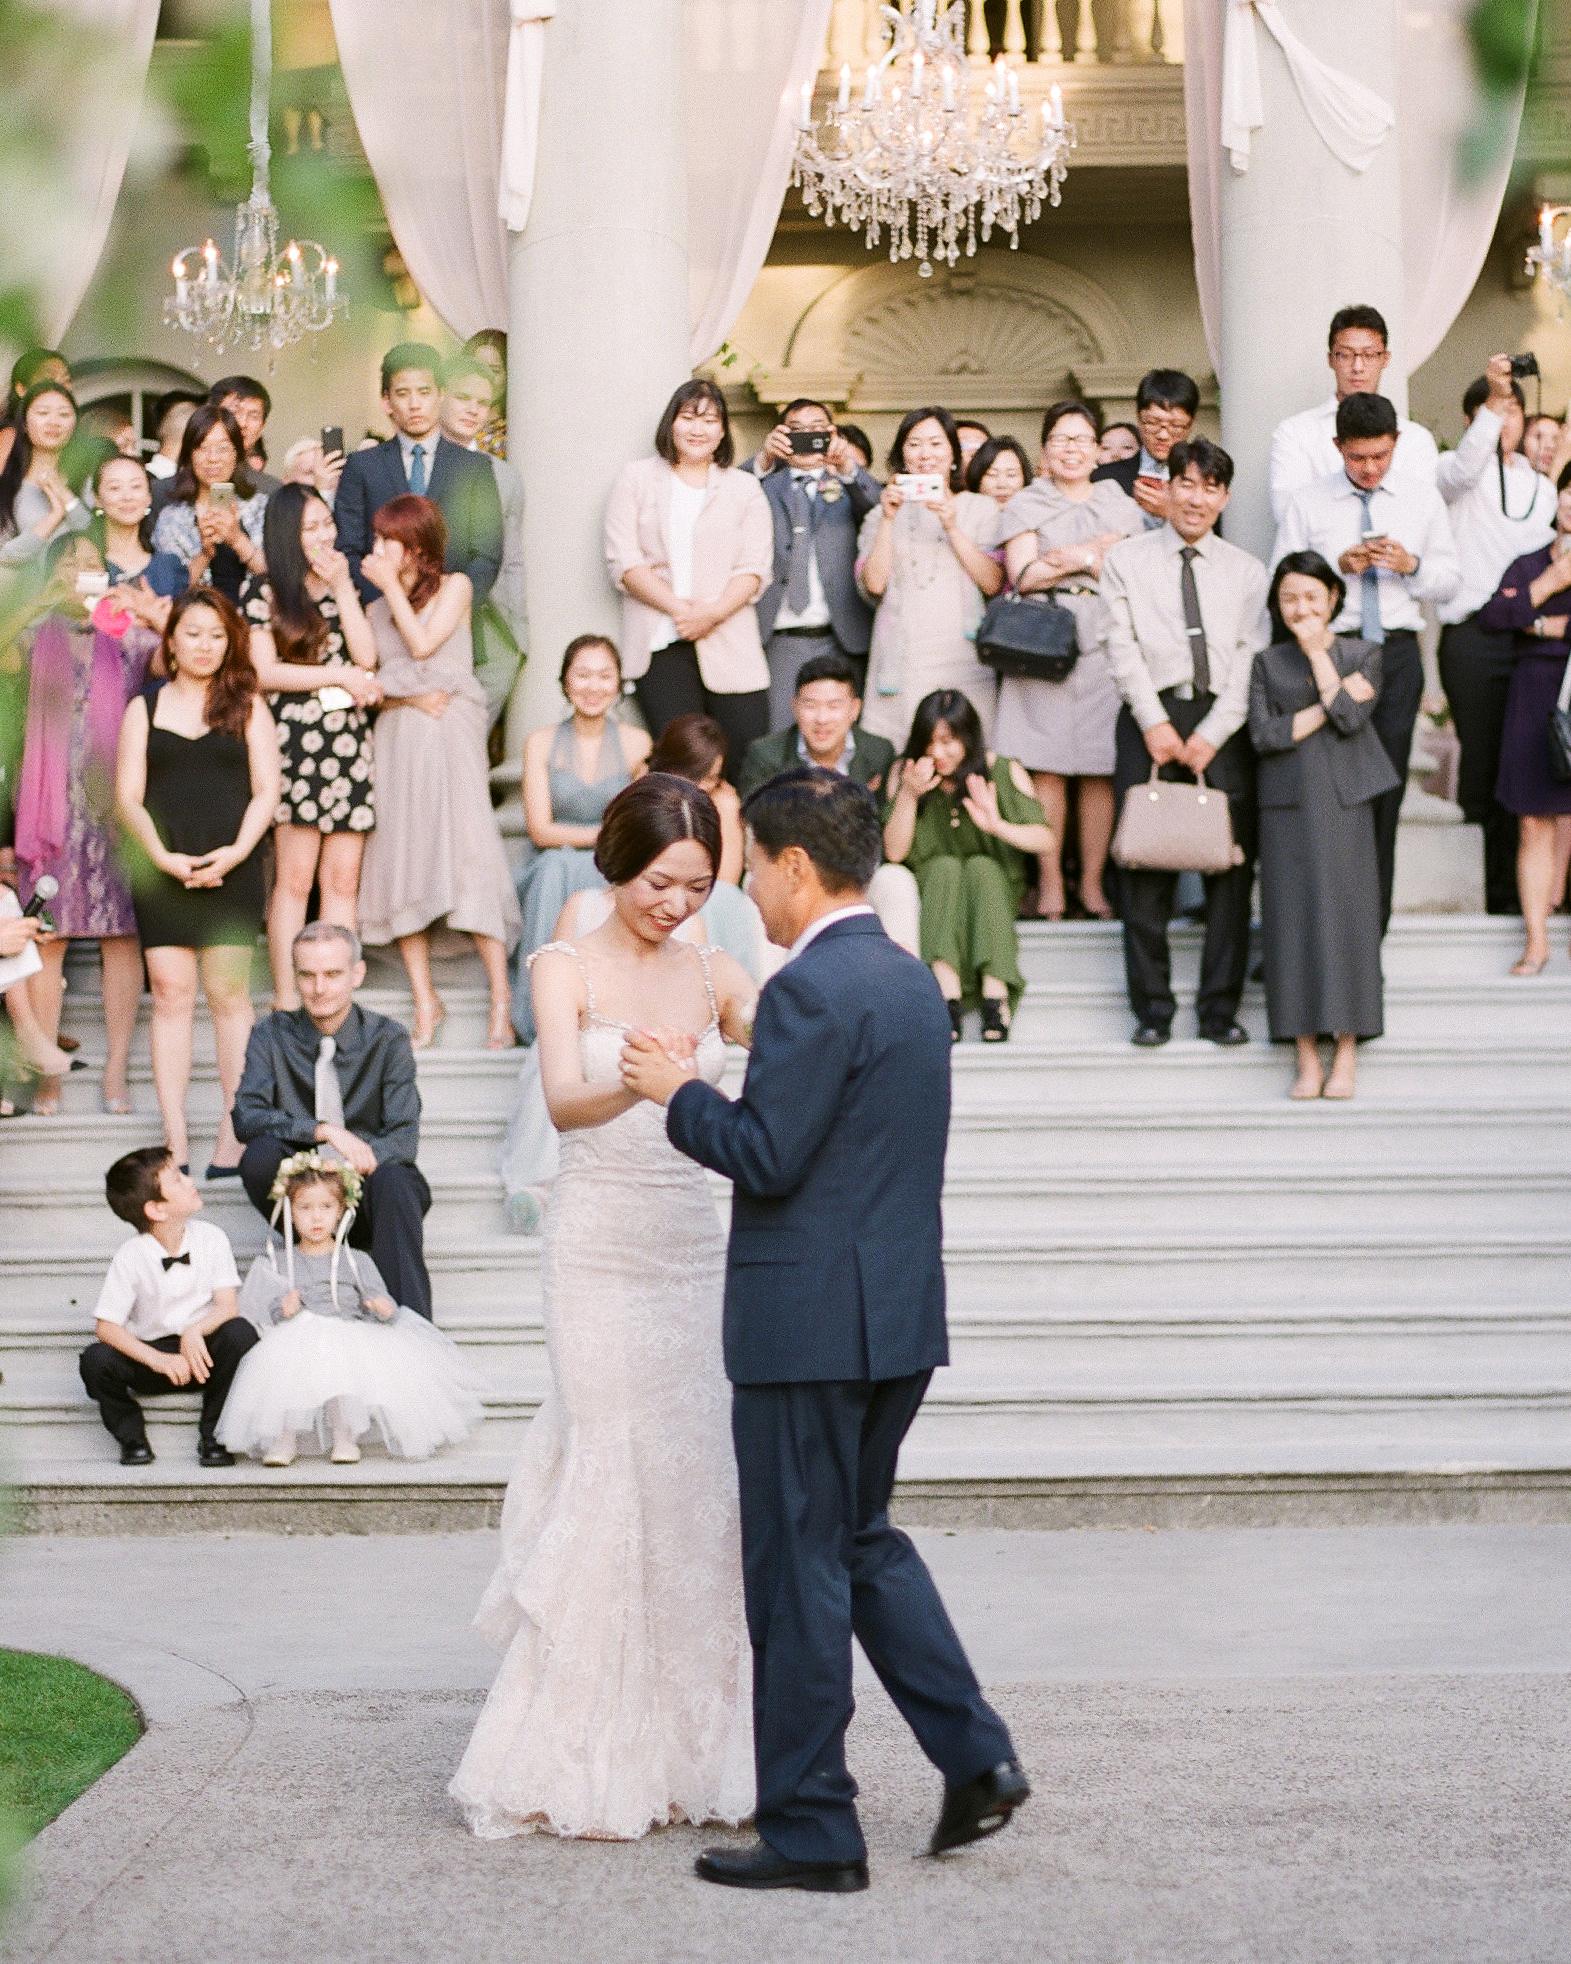 gloria zee wedding first dance